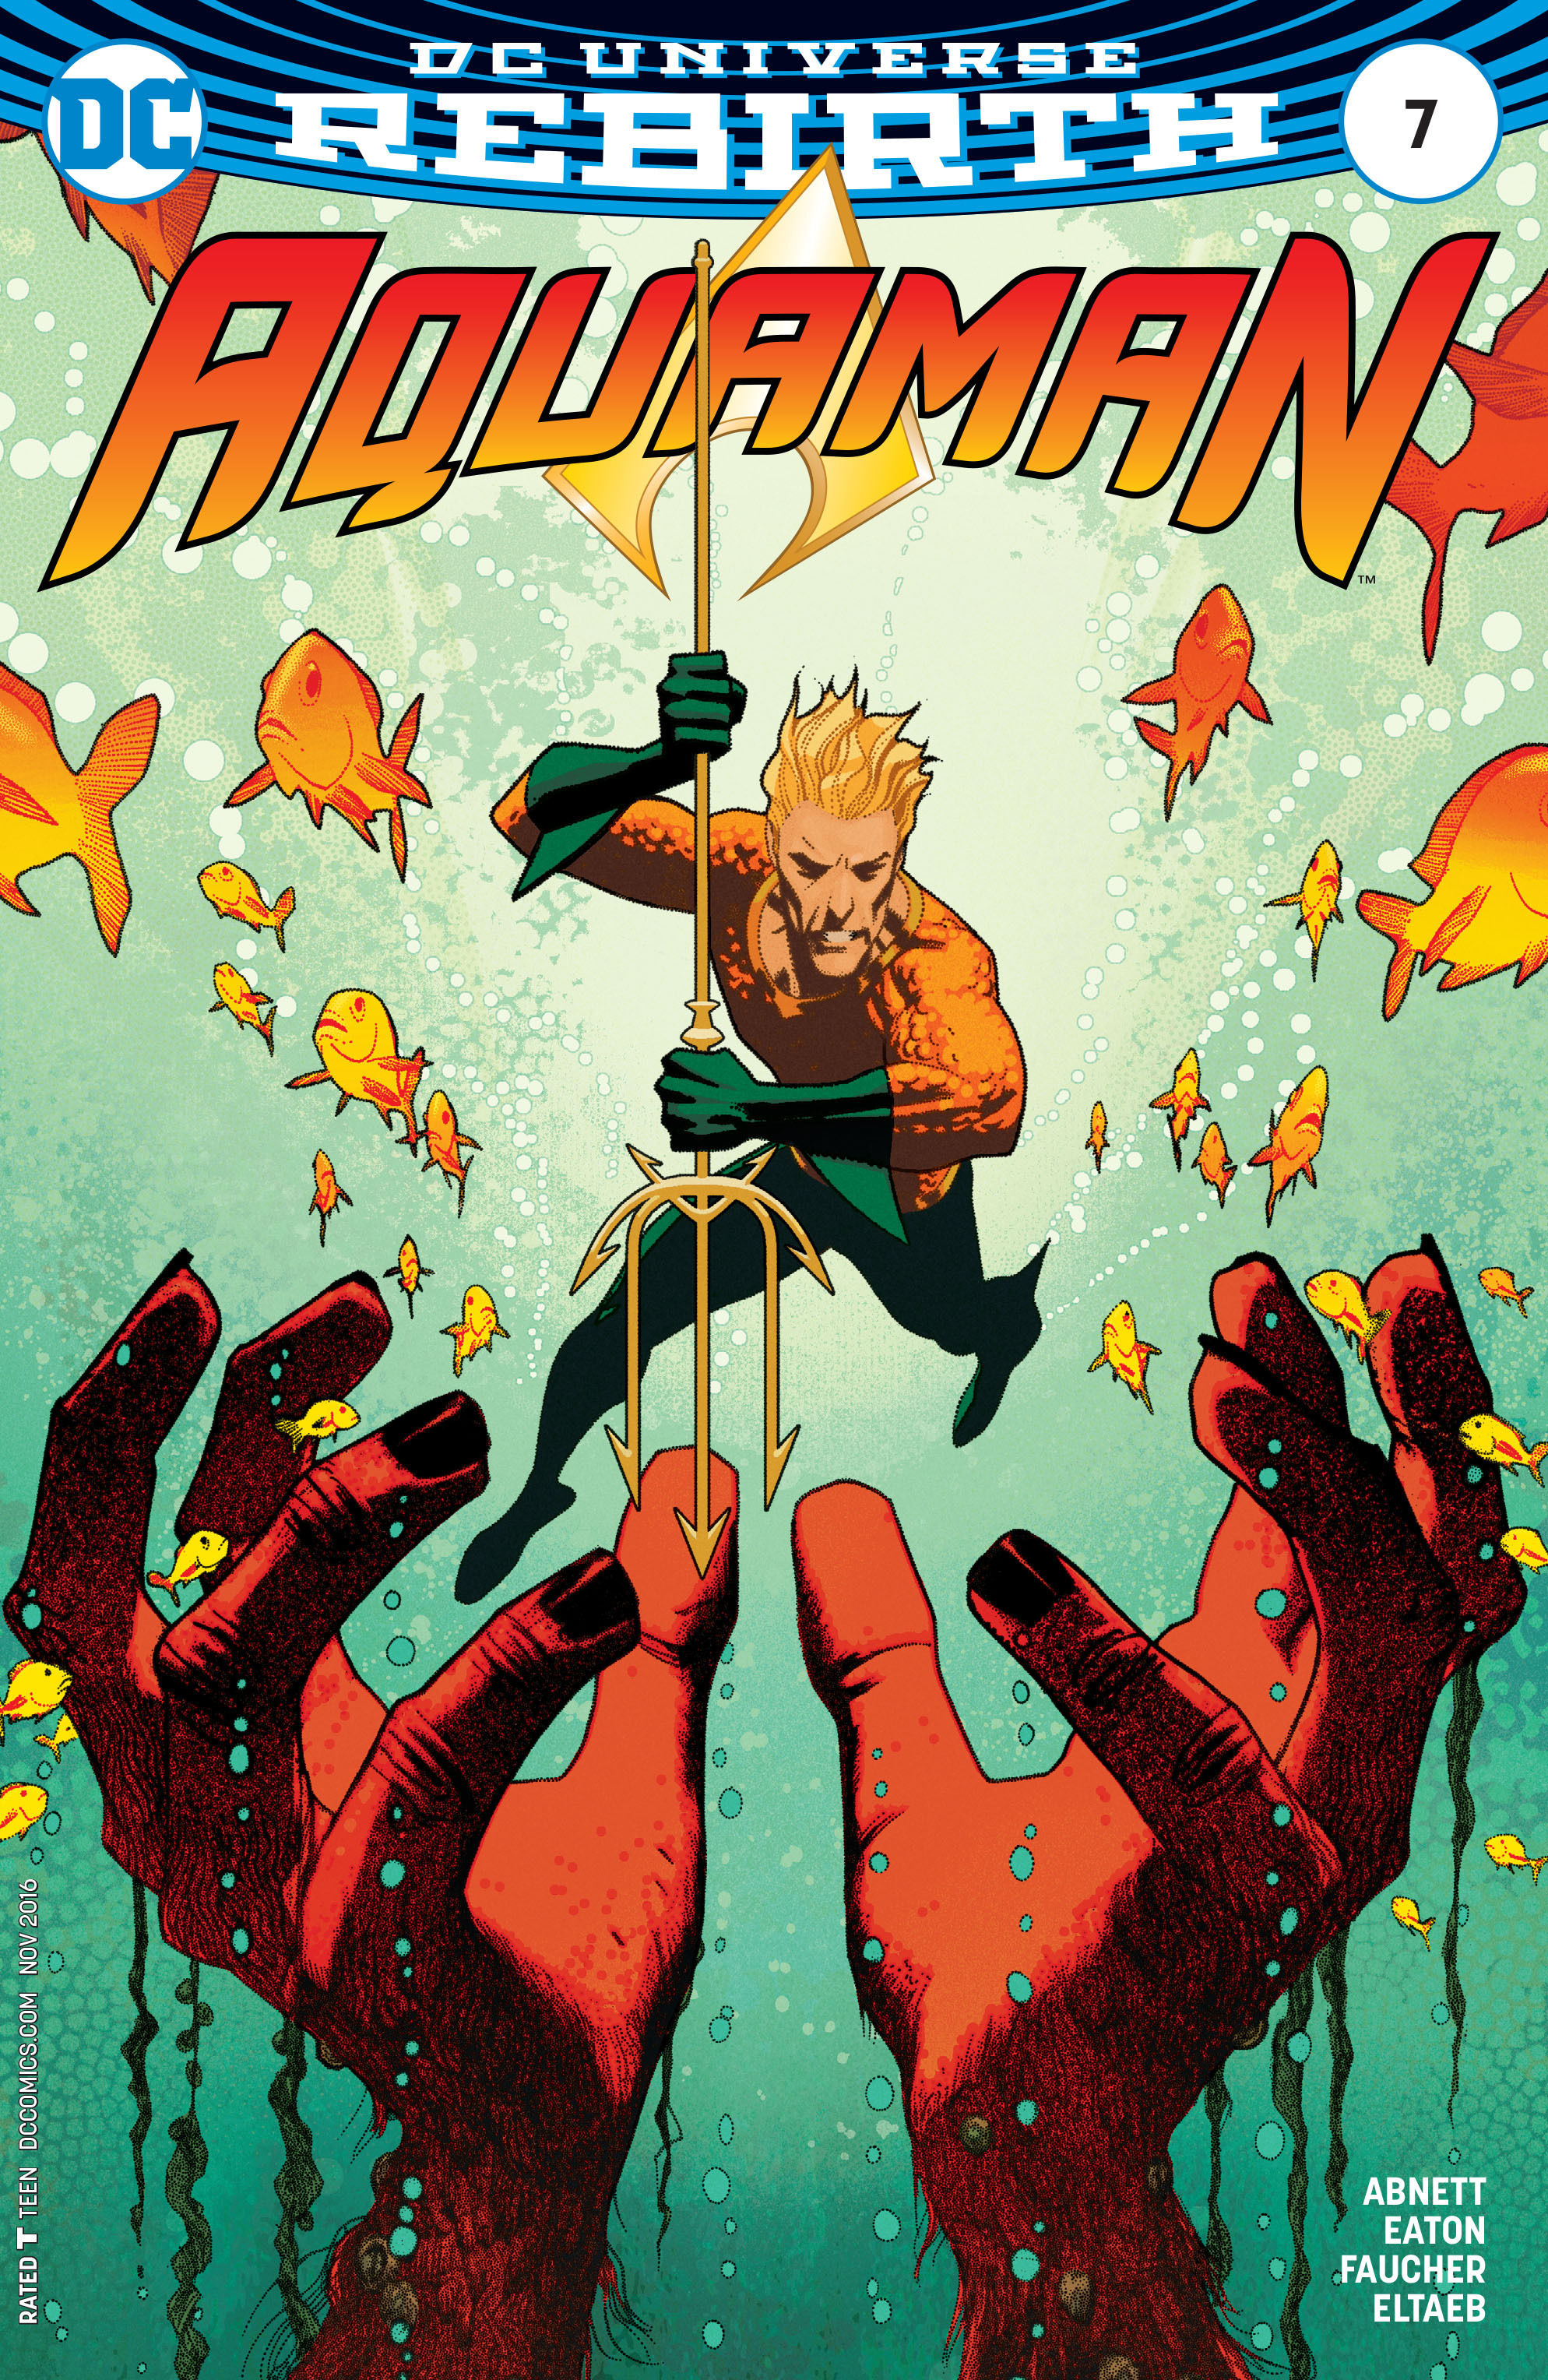 Read online Aquaman (2016) comic -  Issue #7 - 3